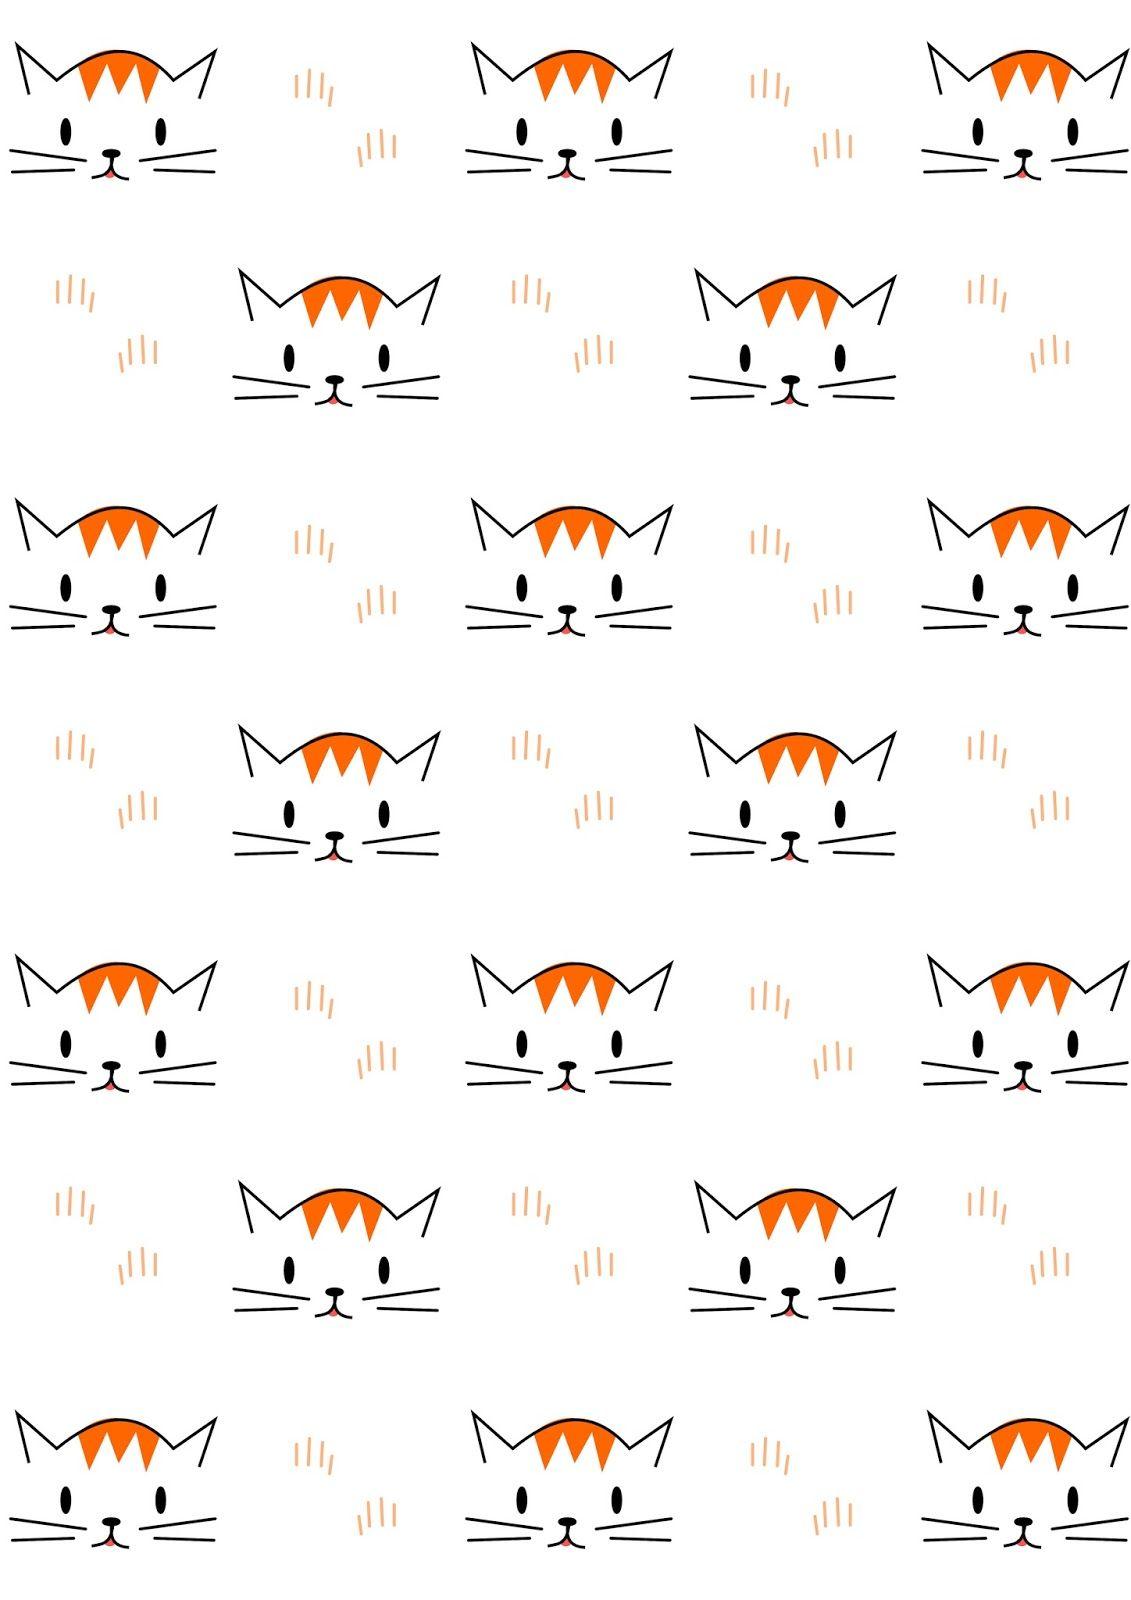 Free Digital Cat Scrapbooking Paper Ausdruckbares Geschenkpapier Freebie Cat Wallpaper Pattern Paper Cat Pattern